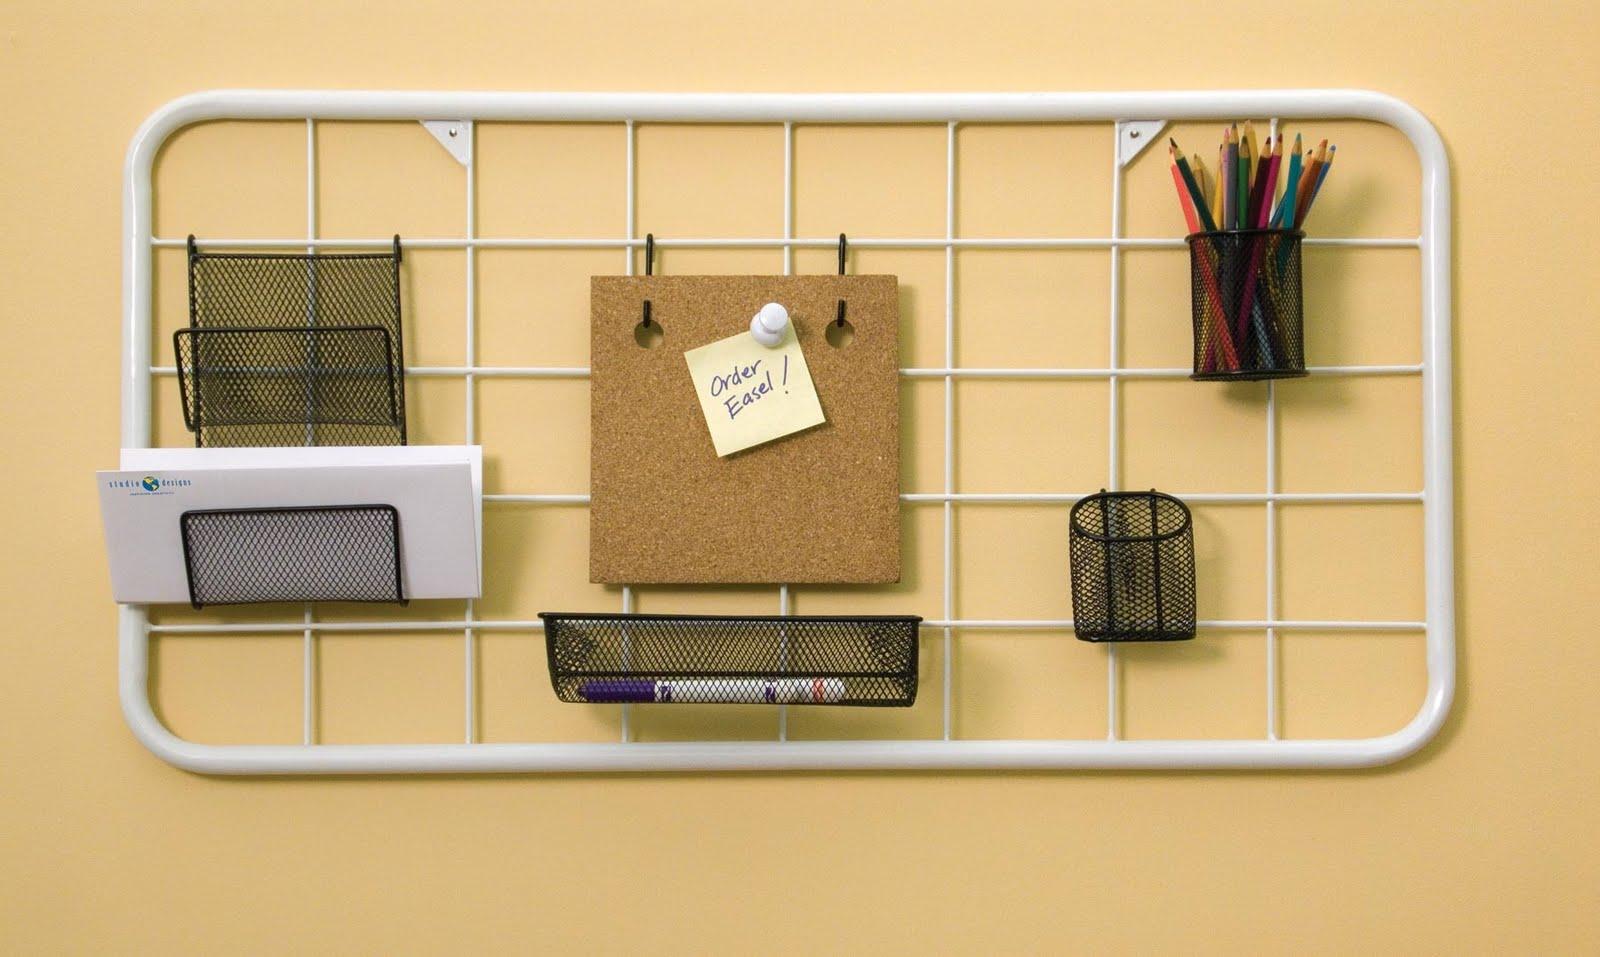 interior design   The Shopbug   Page 6